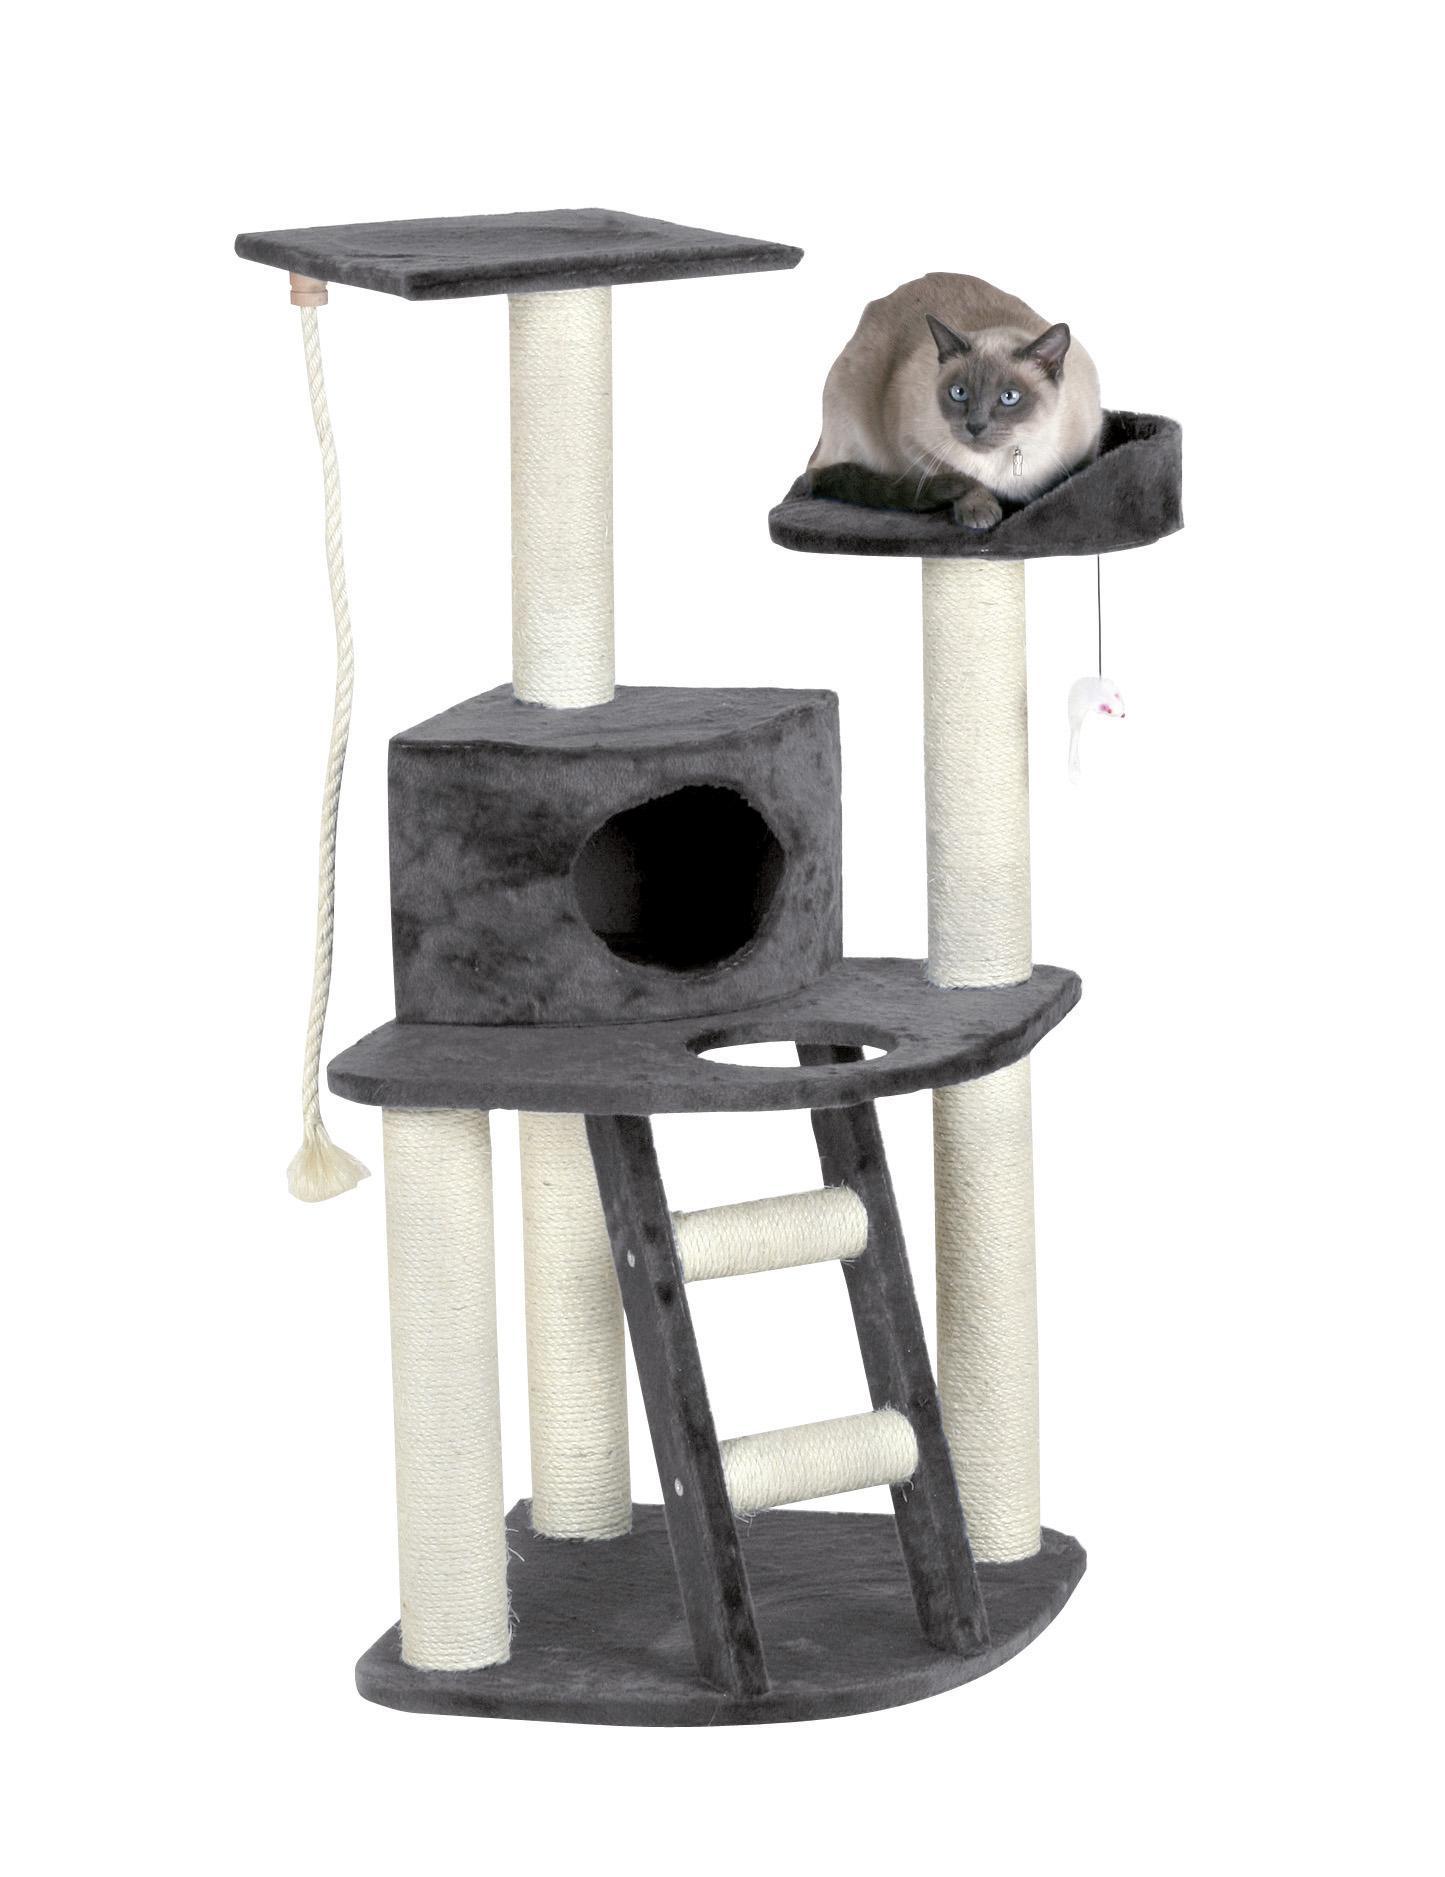 kerbl eck kratzbaum zirkoon grau 55 x 55 x 120 cm haustier. Black Bedroom Furniture Sets. Home Design Ideas